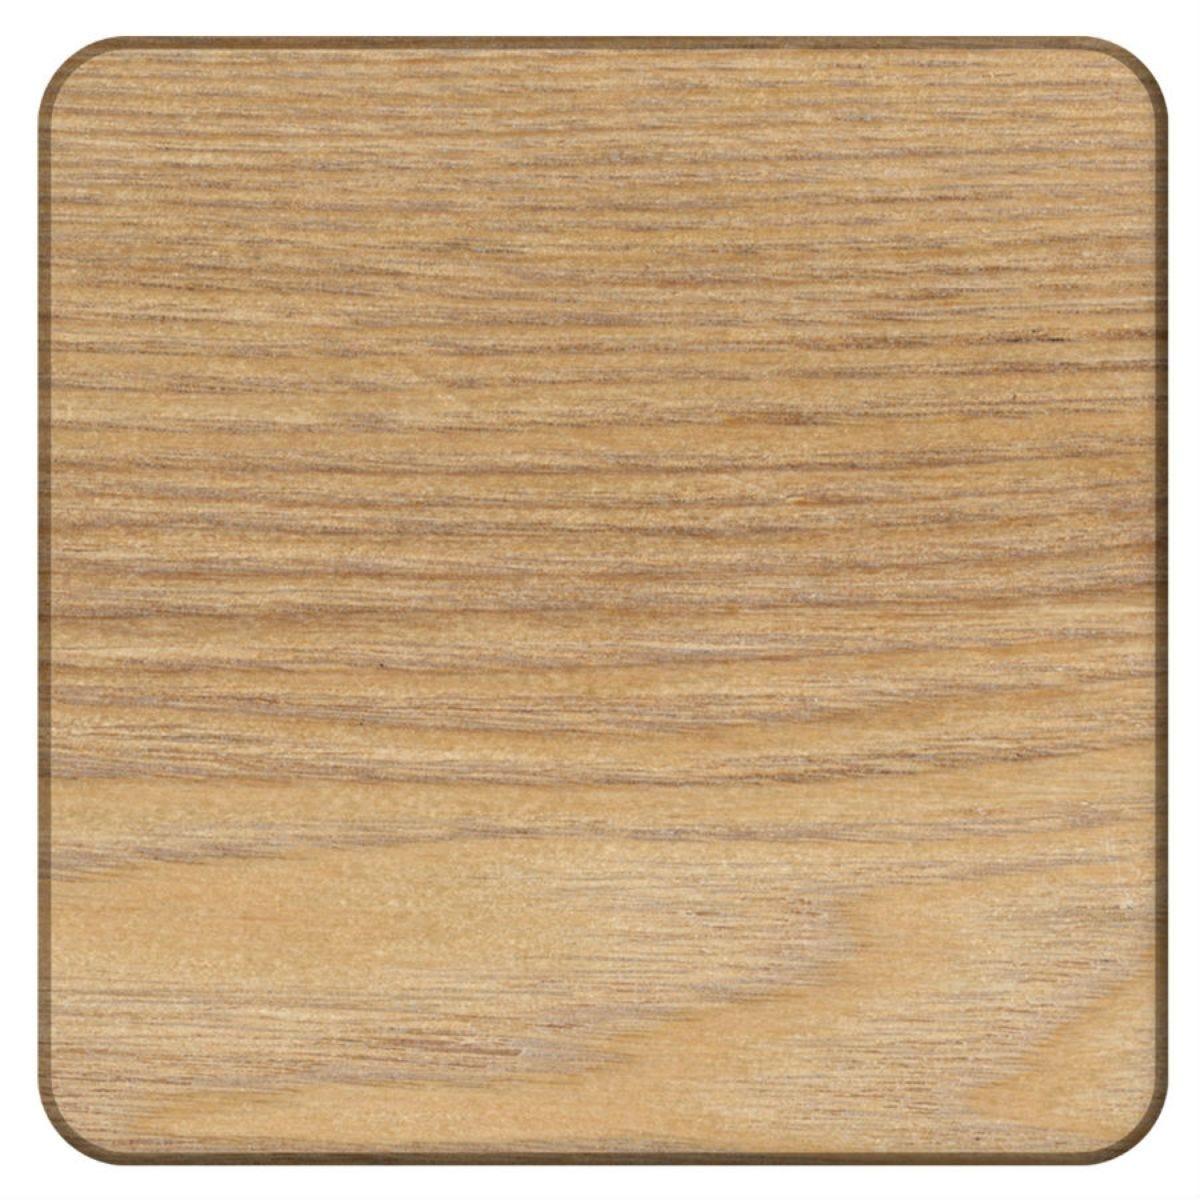 Creative Tops Oak Veneered Coasters - Set of 4